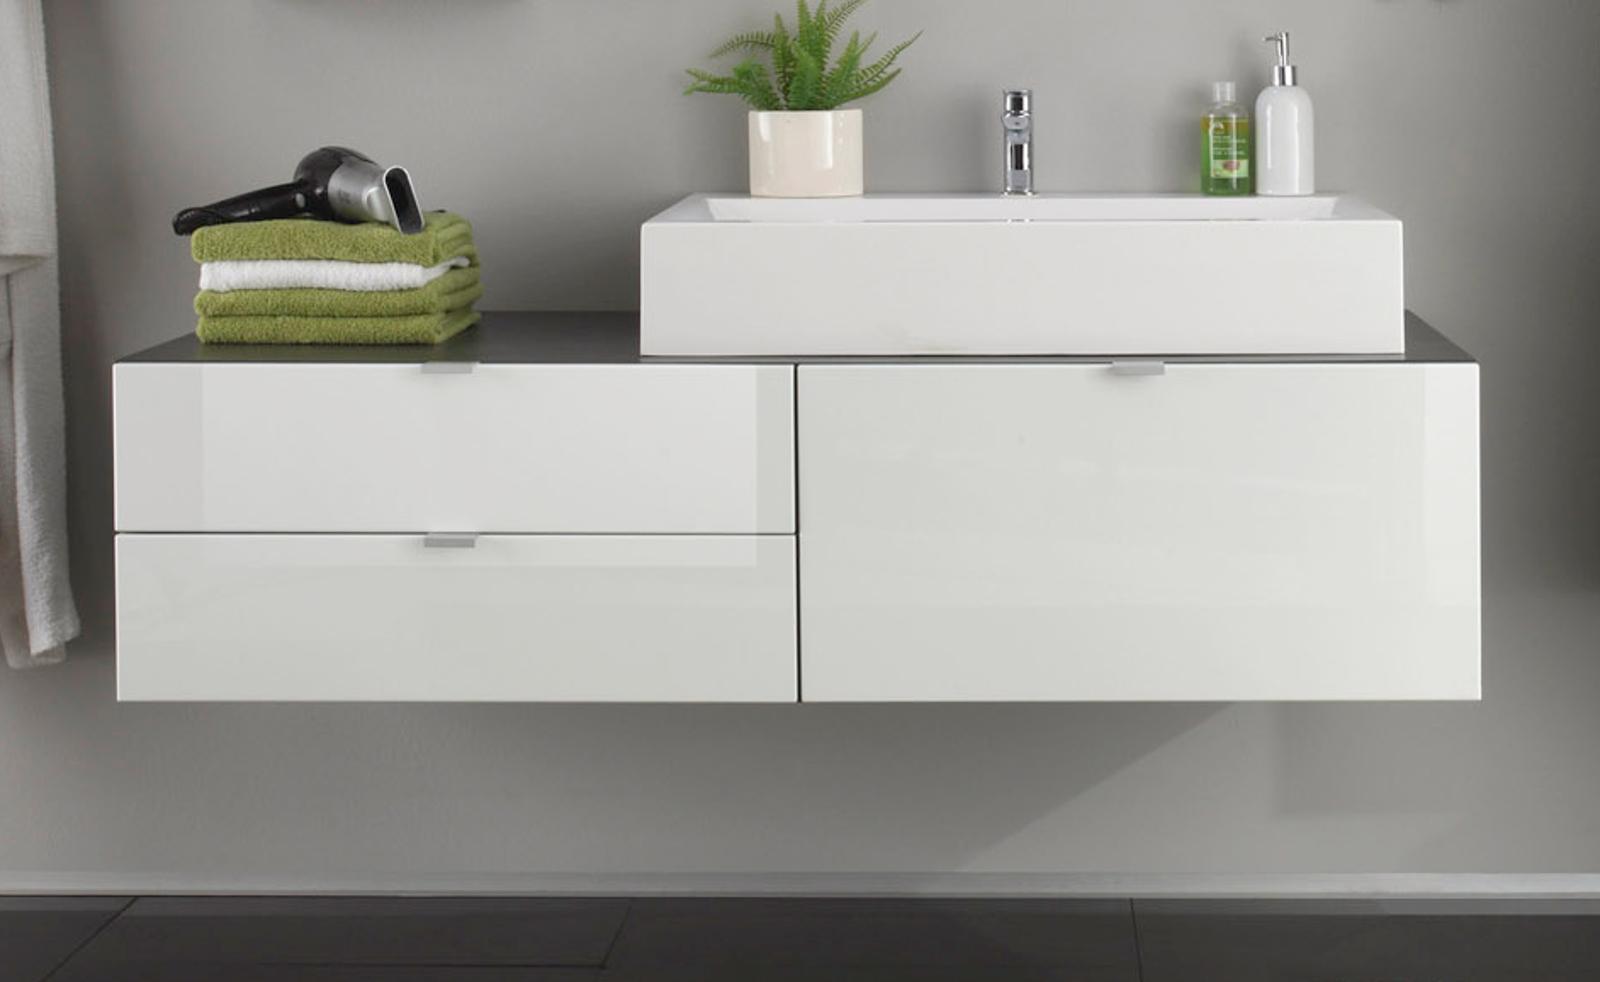 waschbeckenunterschrank h ngend. Black Bedroom Furniture Sets. Home Design Ideas